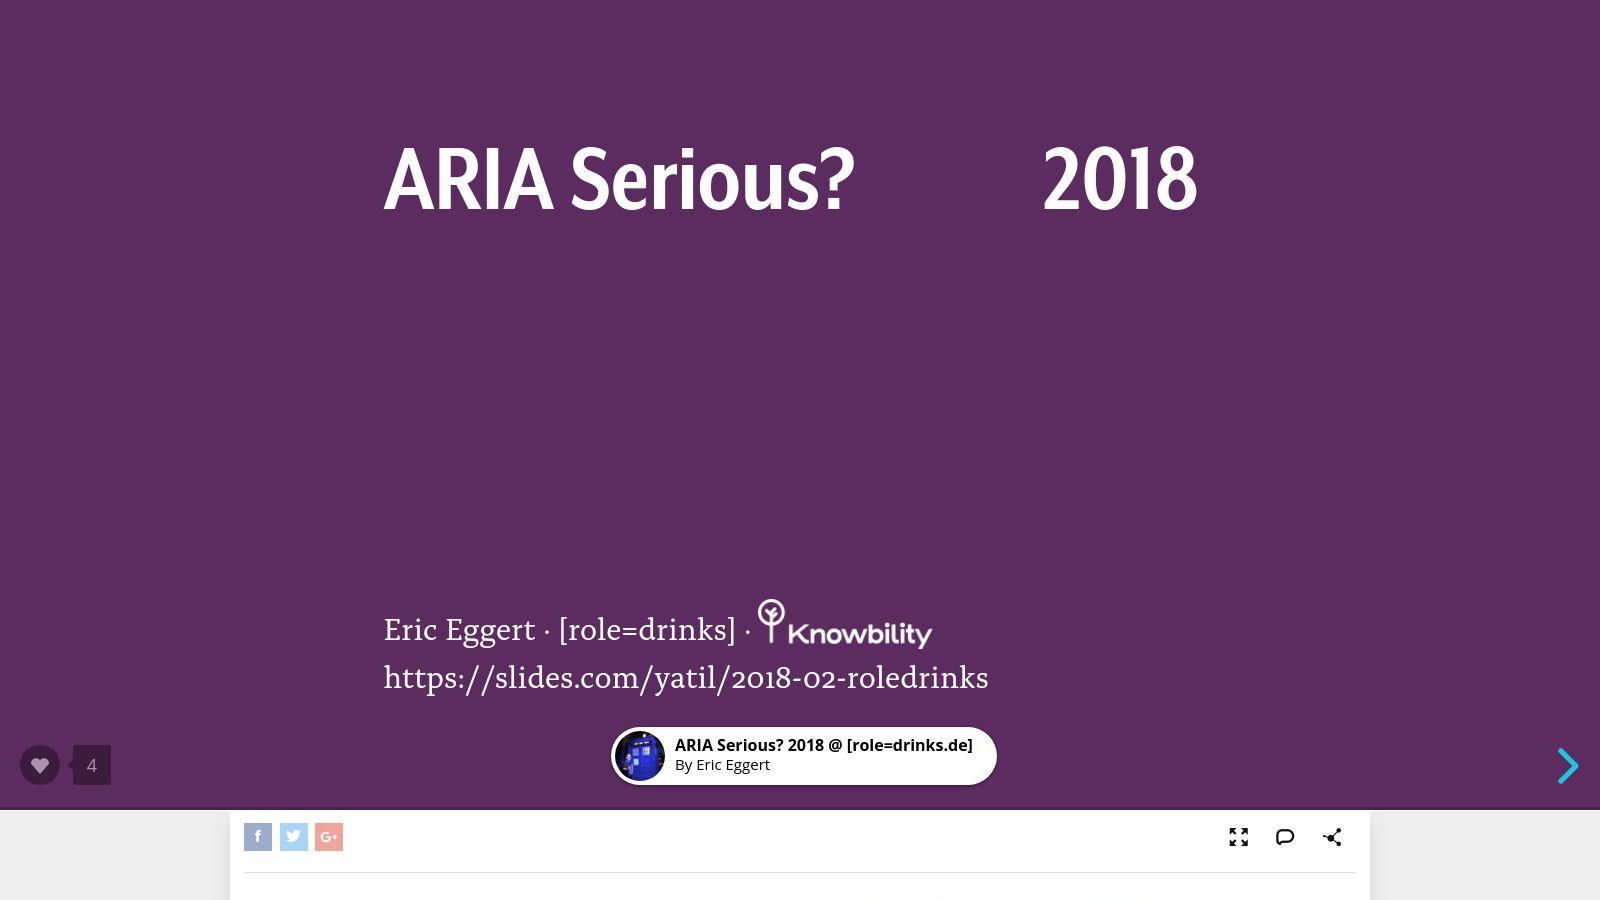 ARIA Serious‽